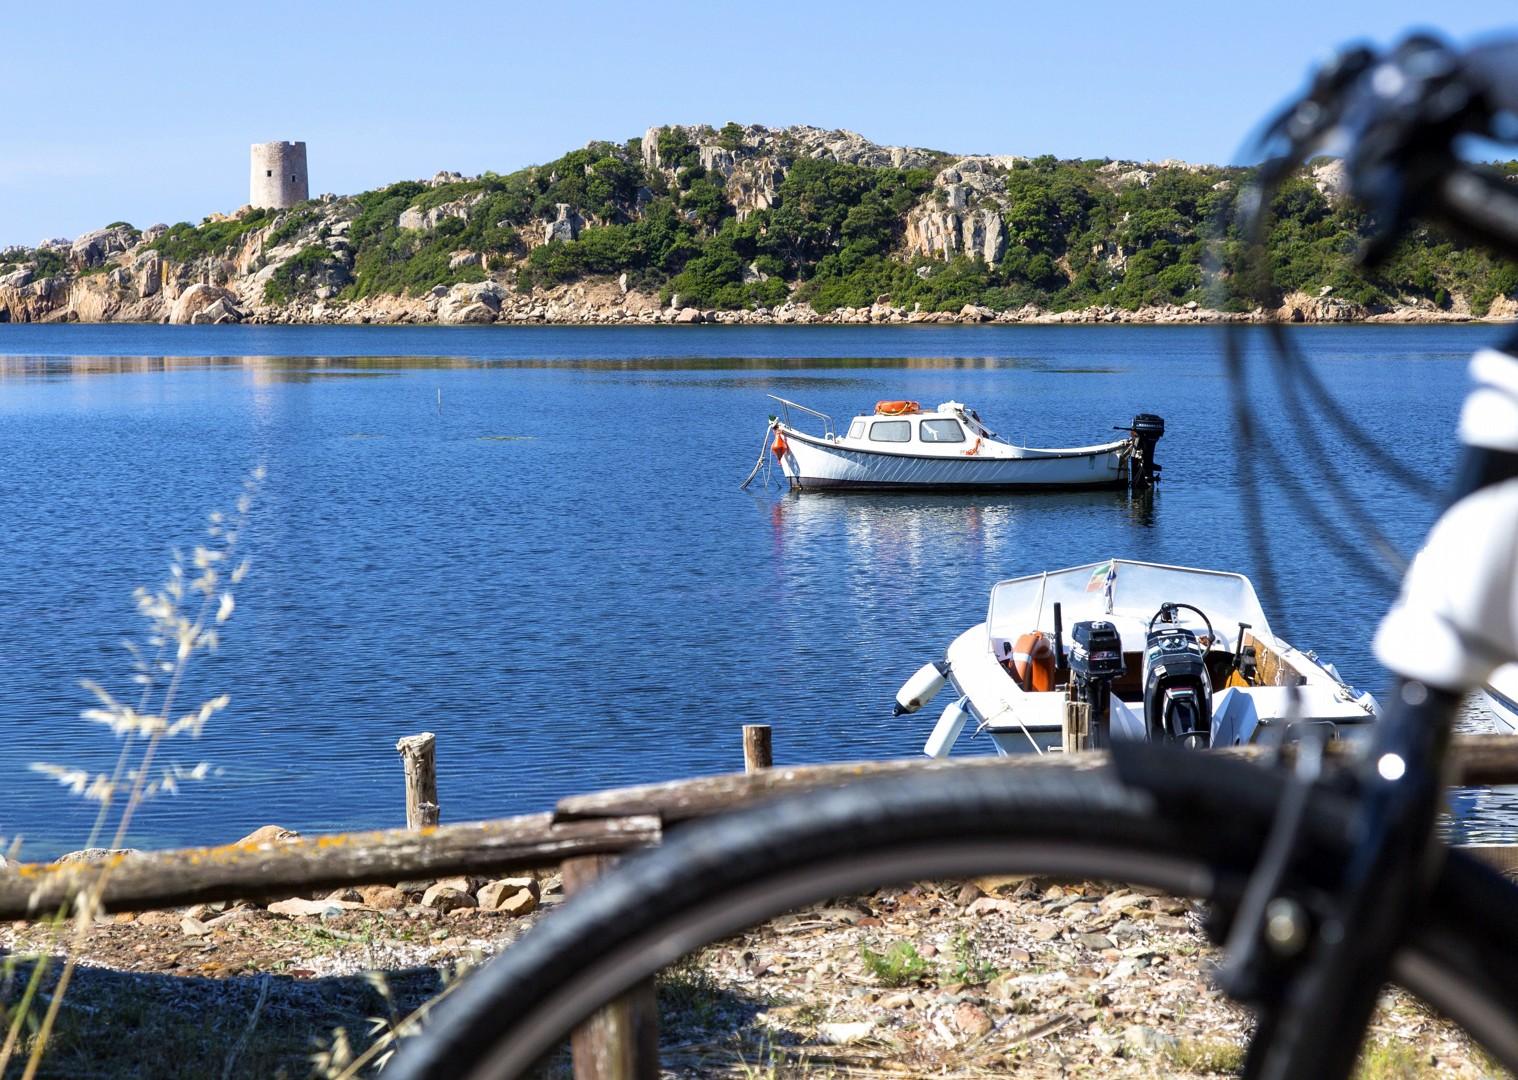 SardiniaCycling-144.jpg - Italy - Sardinia - Family Flavours - Family Cycling